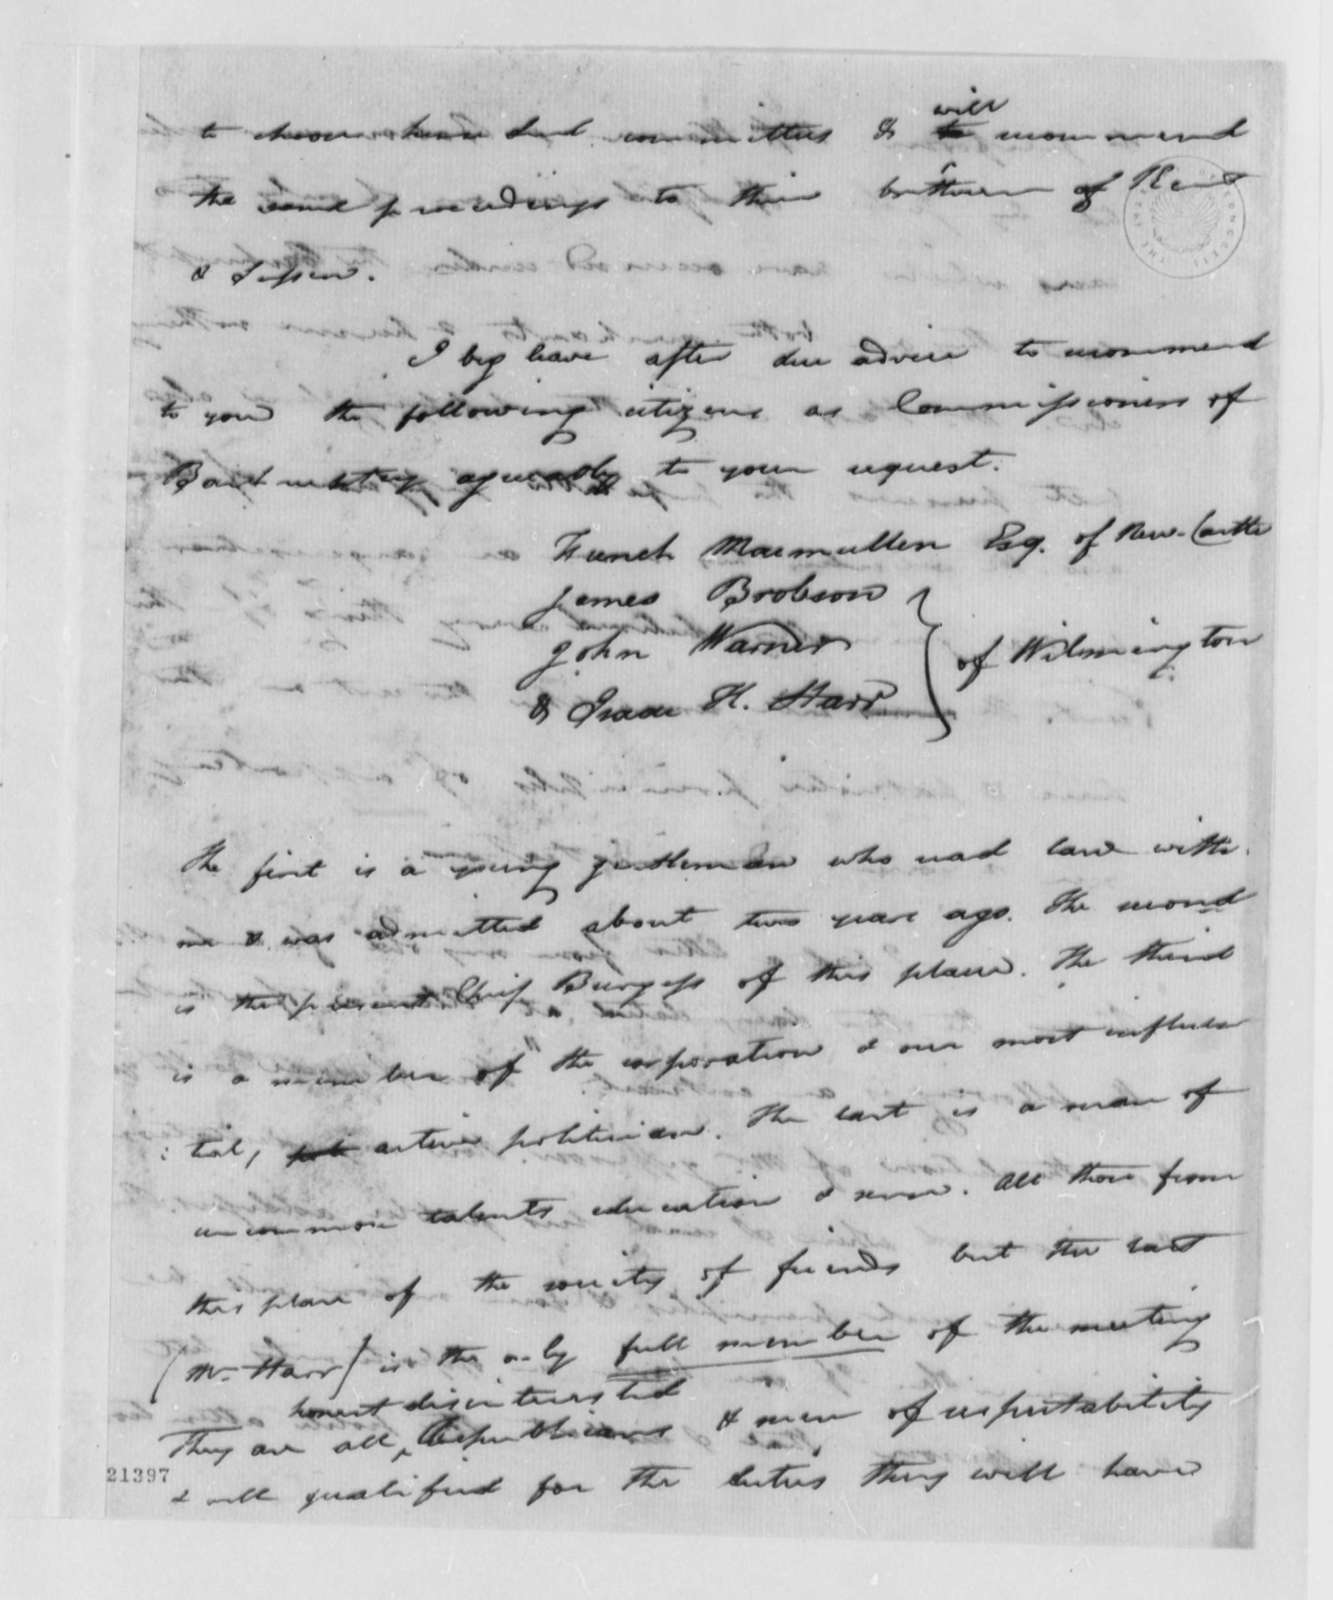 Caesar A. Rodney to Thomas Jefferson, June 28, 1802